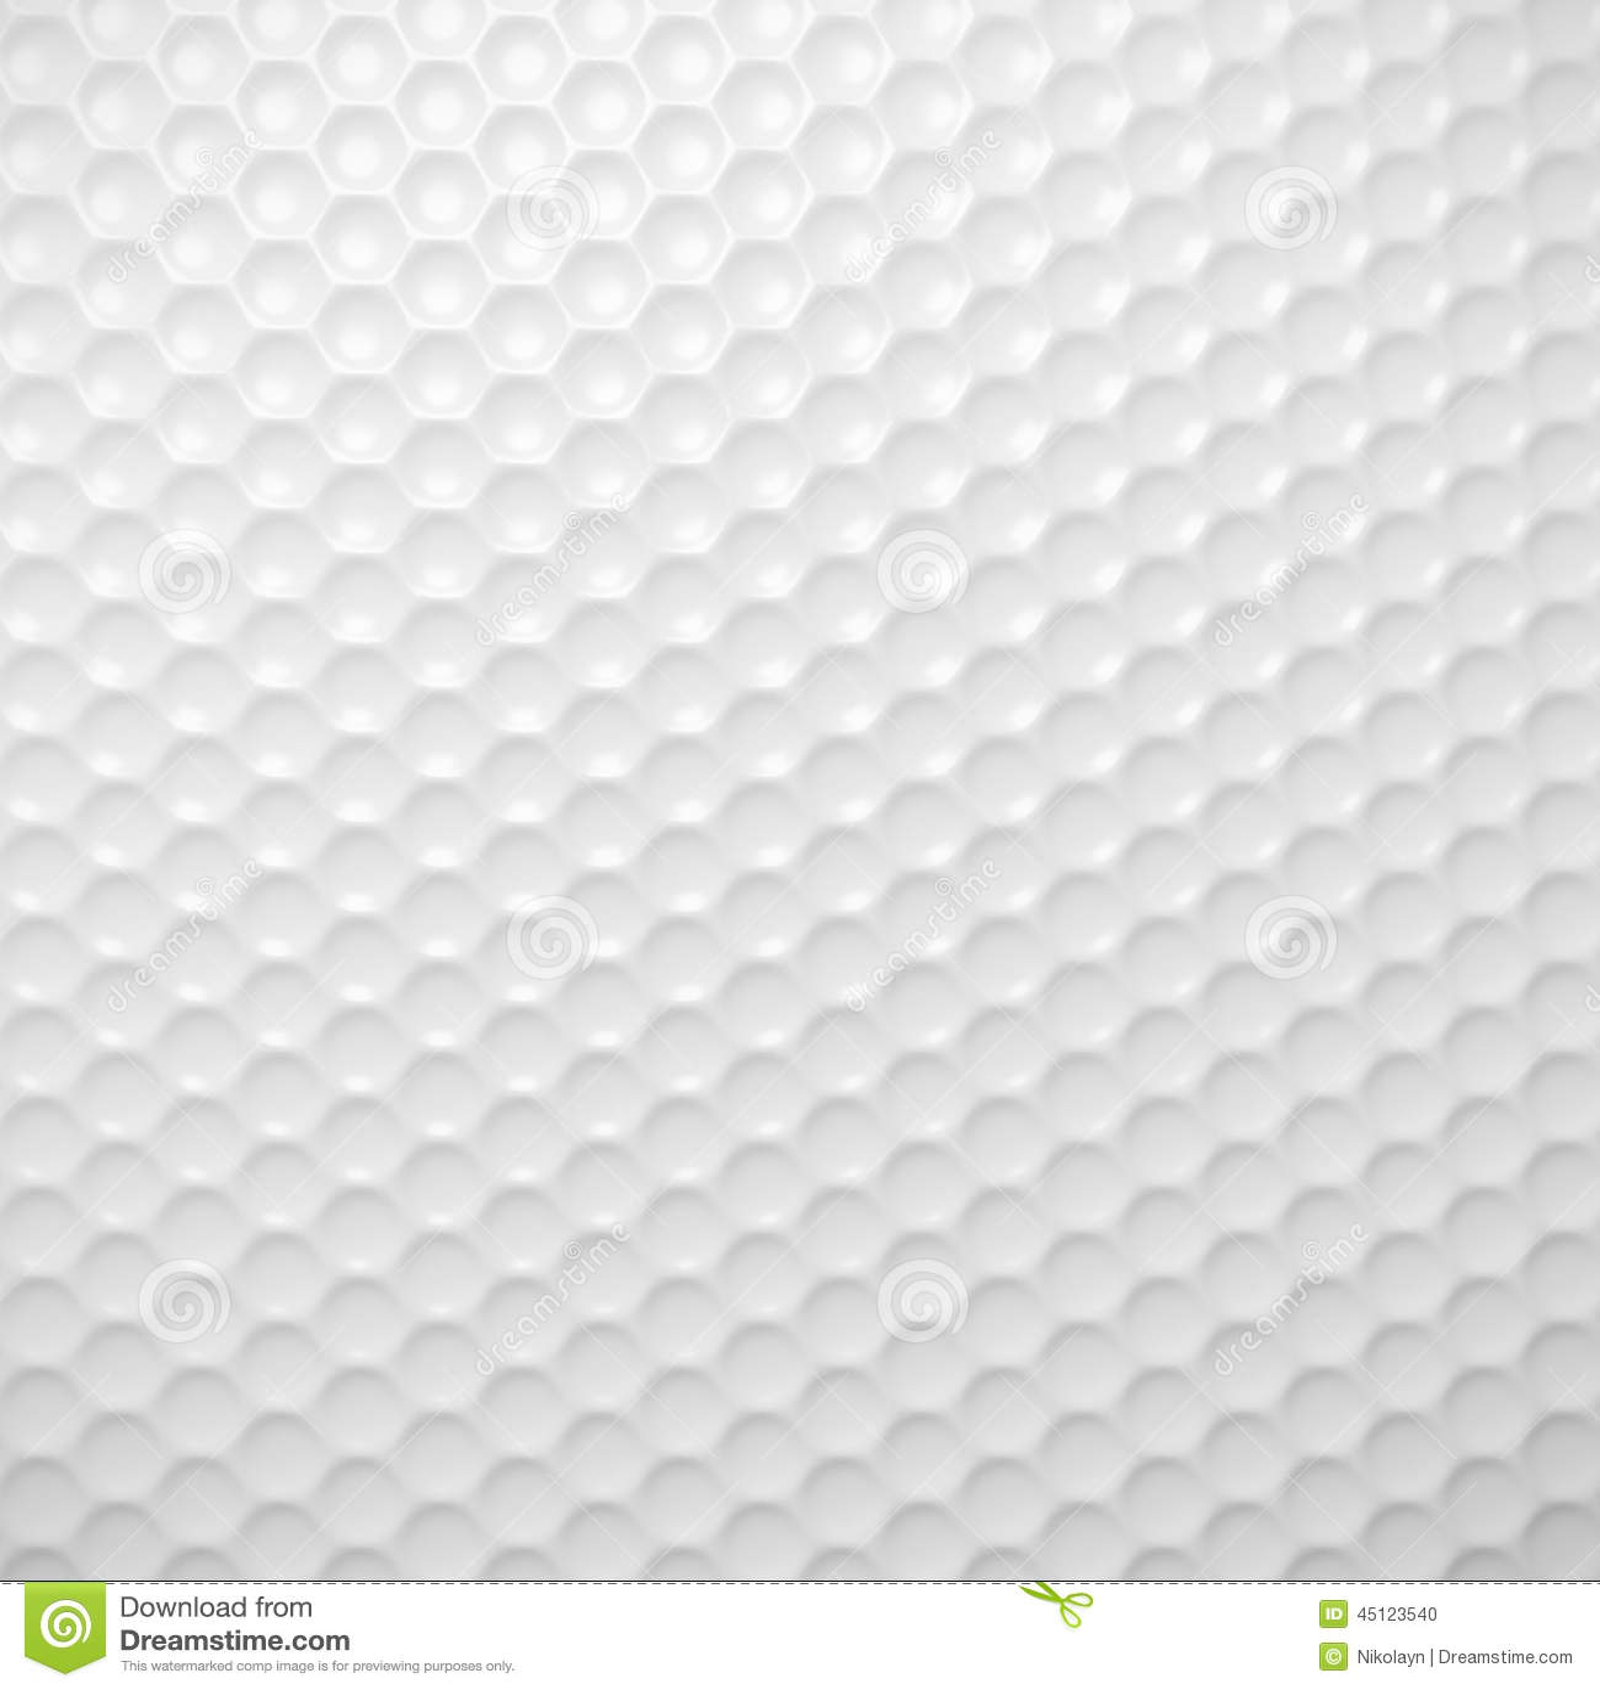 Golf Ball Wallpaper Background Texture Stock Illustration ... Golf Ball On Tee Clipart